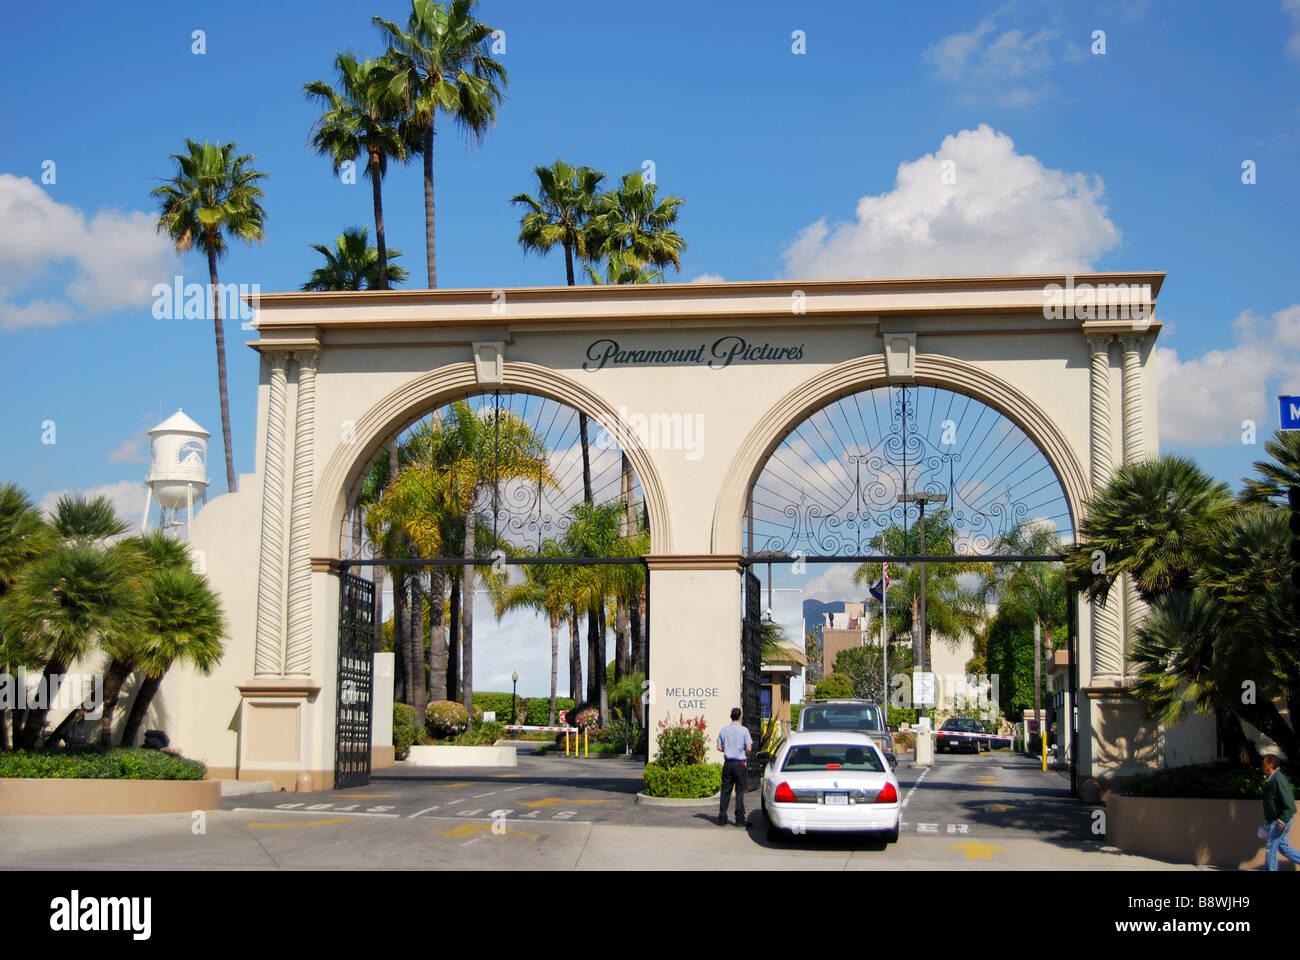 Eingang zu Paramount Studios, Melrose Avenue, Hollywood, Los Angeles, California, Vereinigte Staaten von Amerika Stockfoto